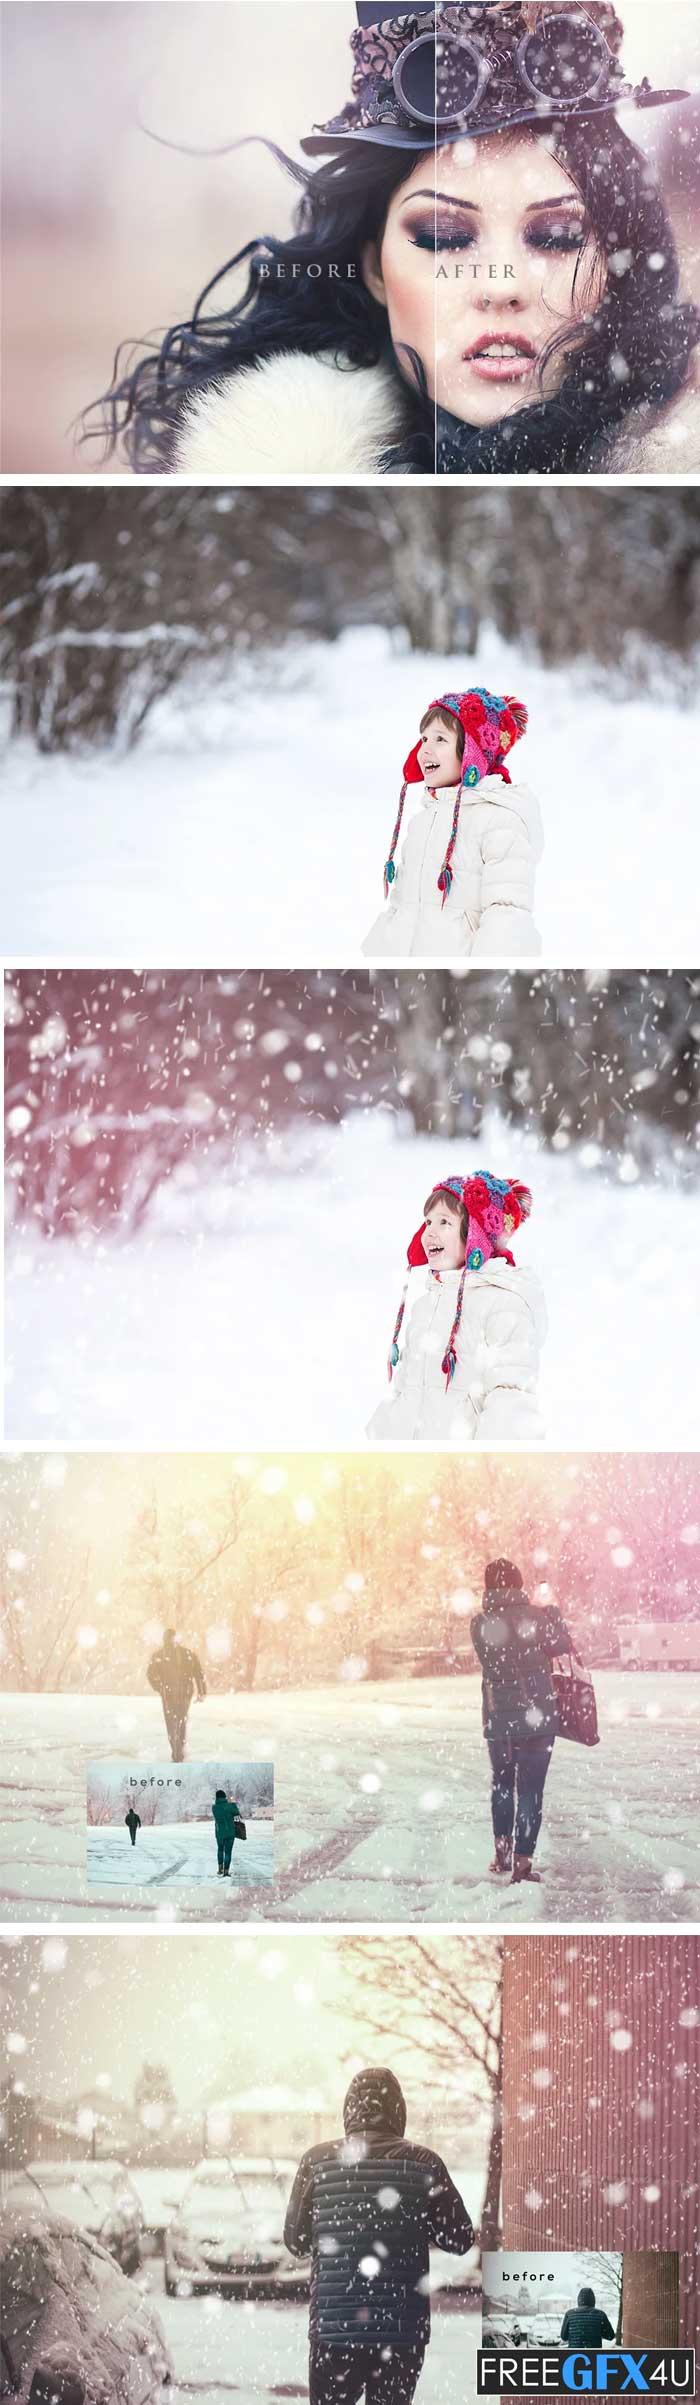 Natural Snow Overlays Photoshop